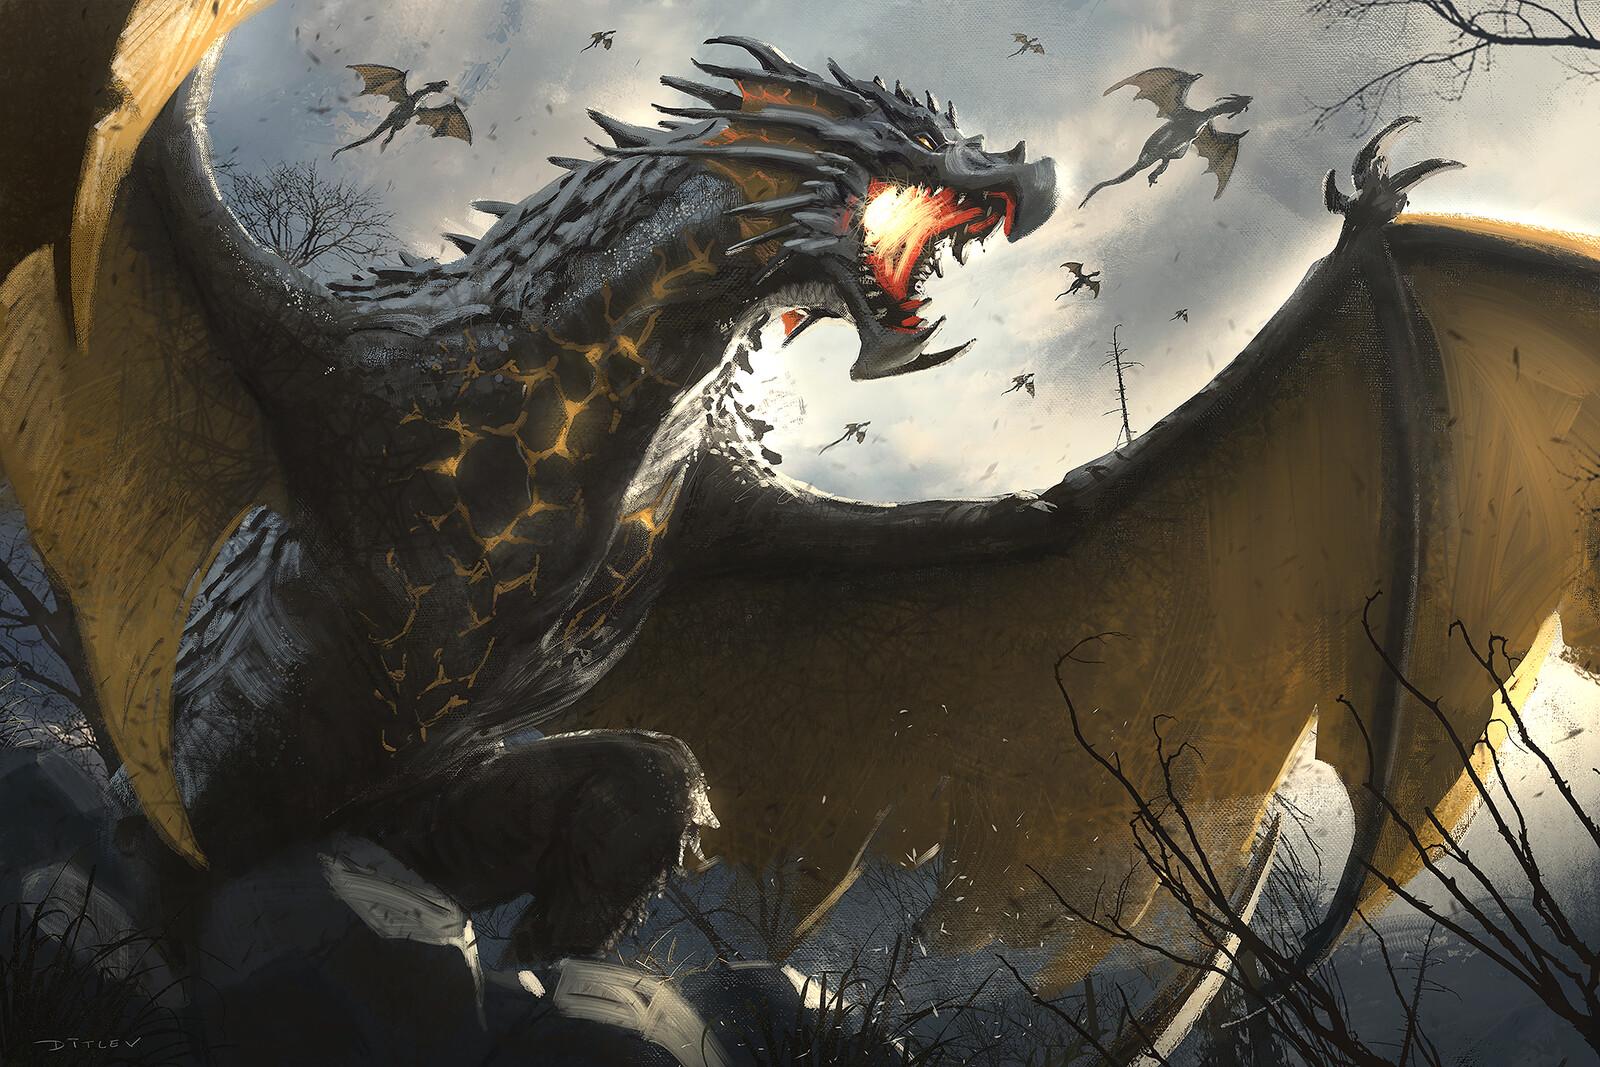 Den of dragons